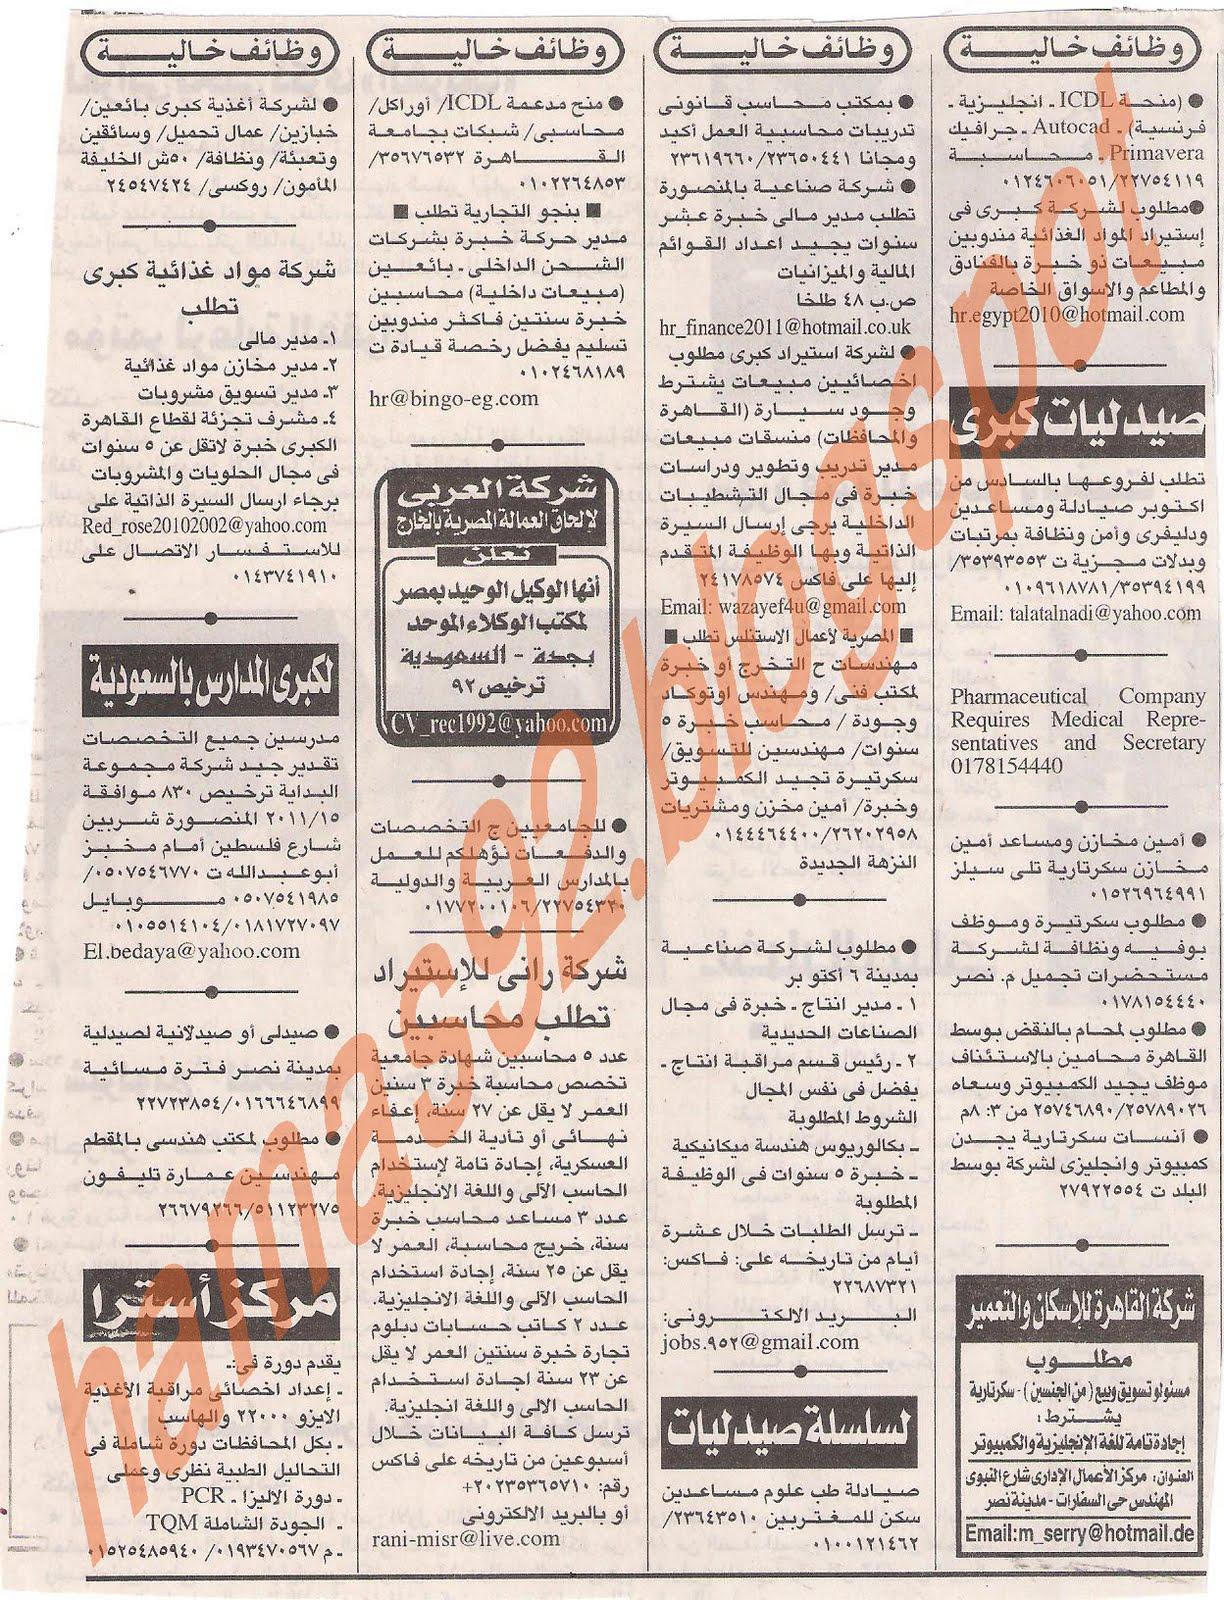 وظائف اهرام الجمعه 8 يوليو 2011 - وظائف خاليه: http://hamas92.blogspot.com/2011/07/8-2011.html